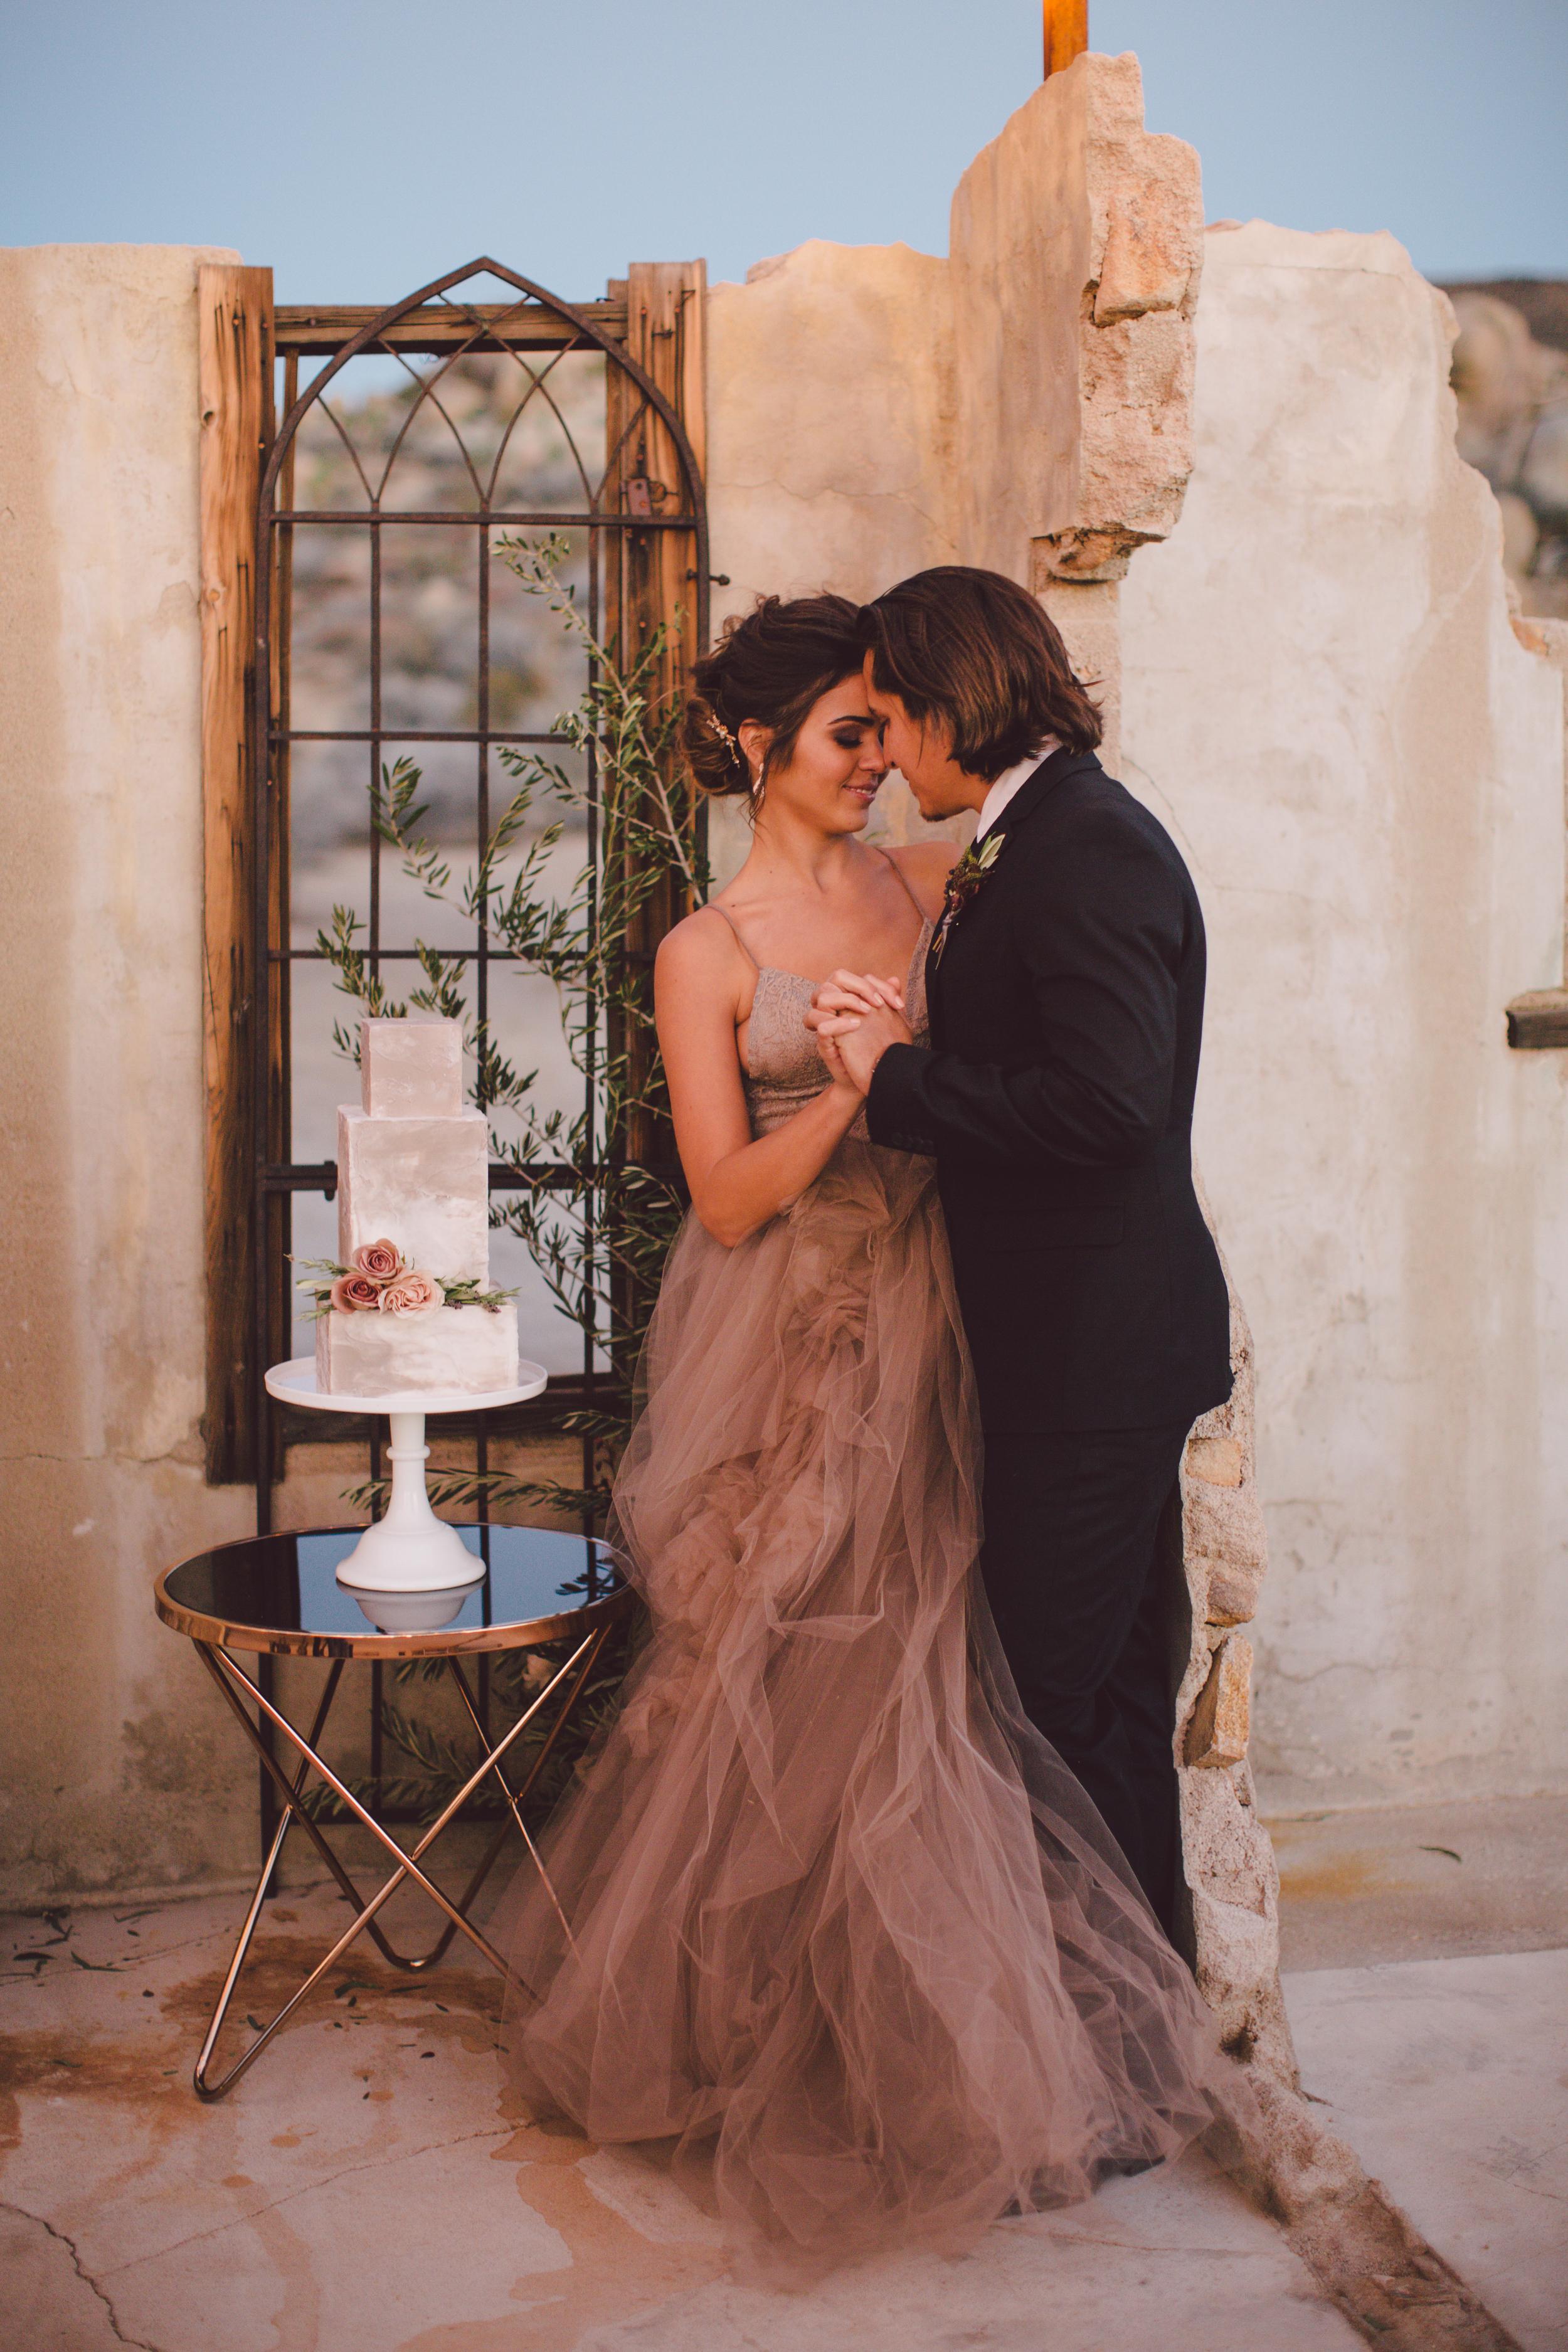 The ruin joshua tree yucca valley elopement wedding